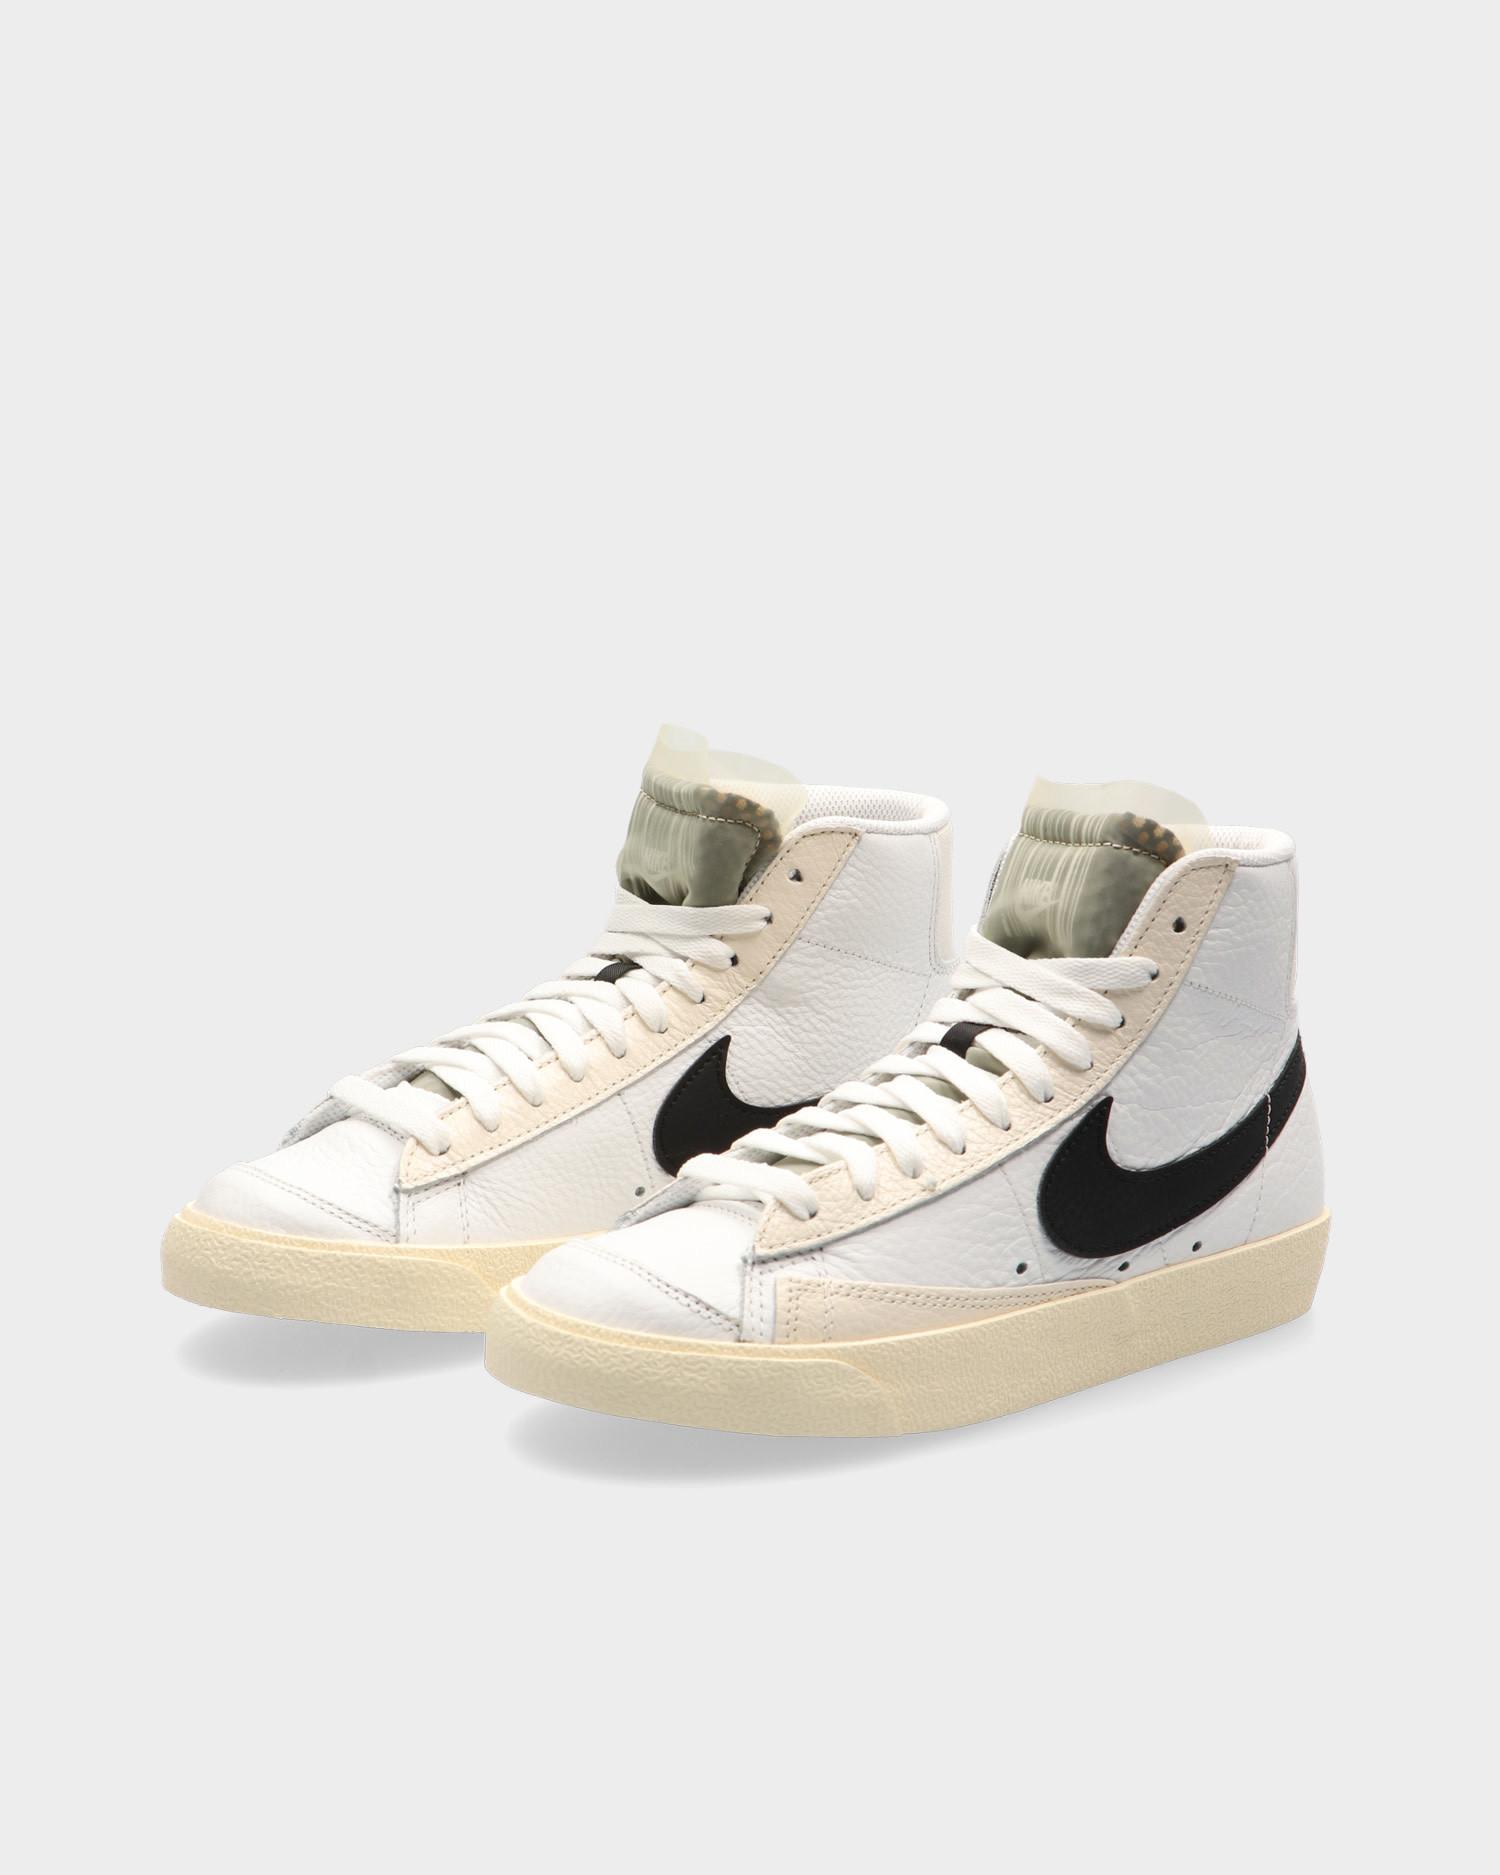 Nike Blazer Mid '77 Summit White/Black-Pale Ivory-Beach